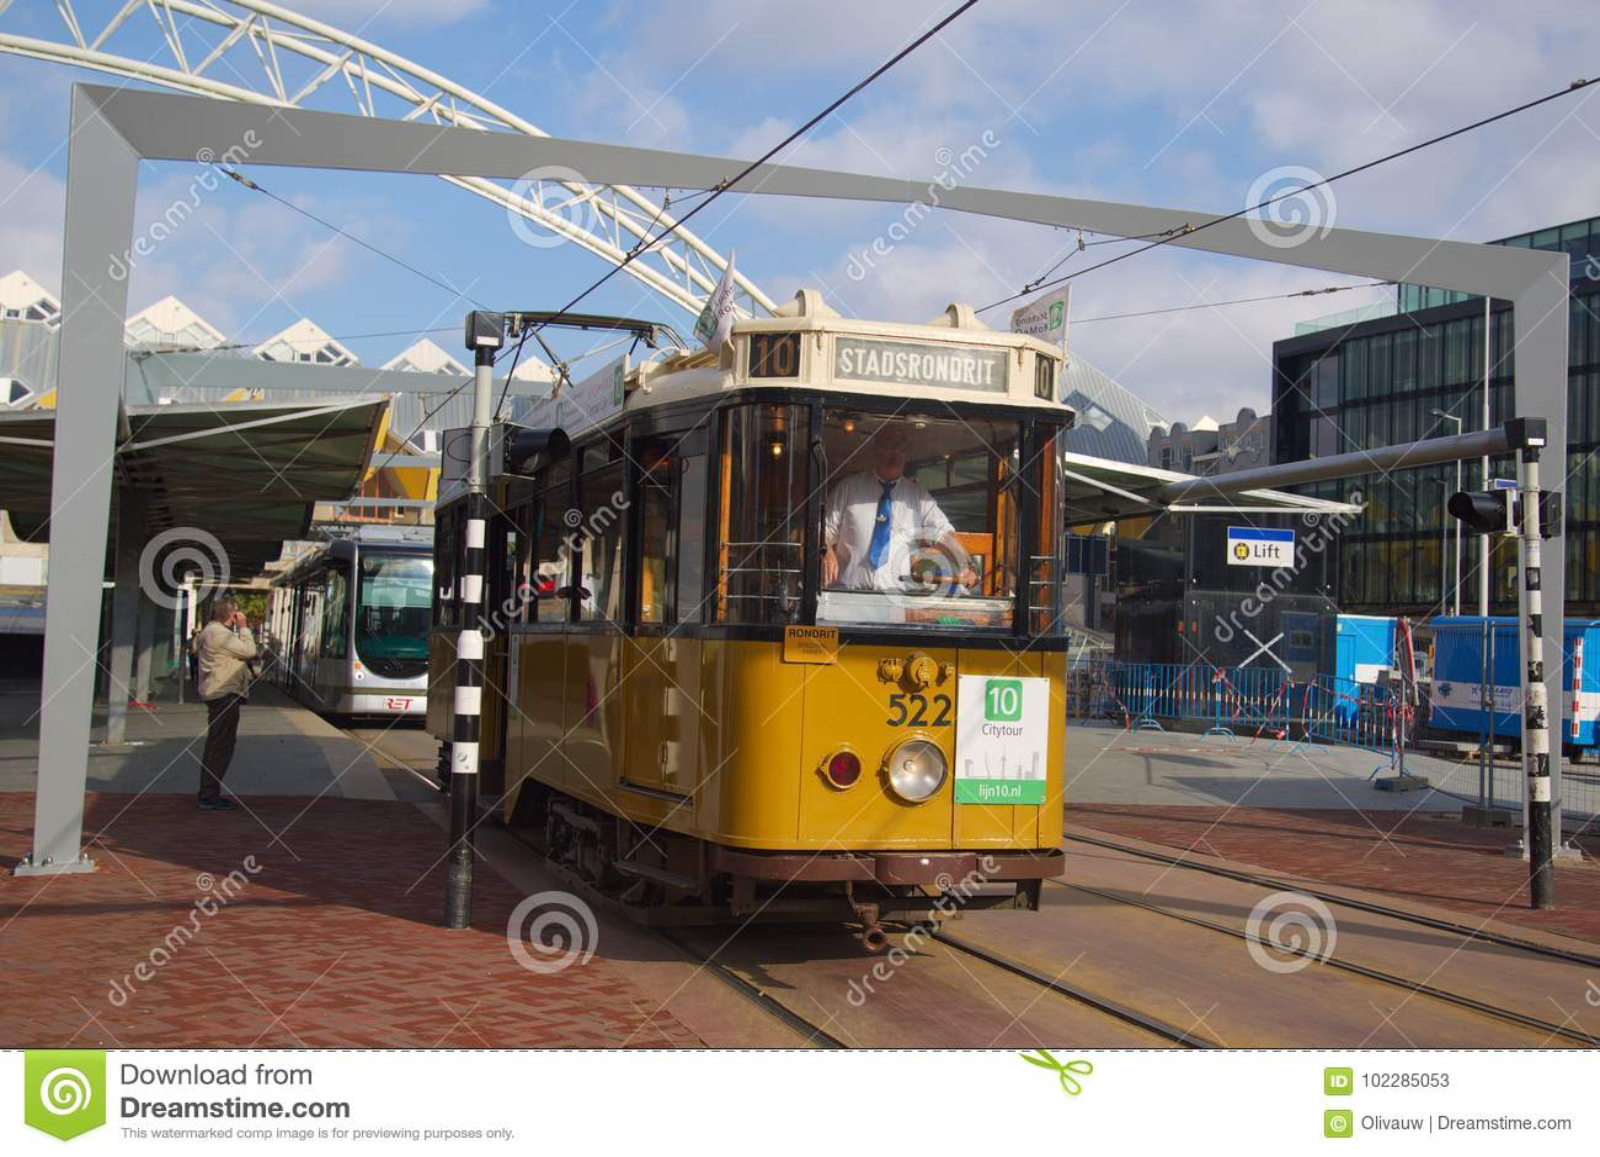 Touristic Tram